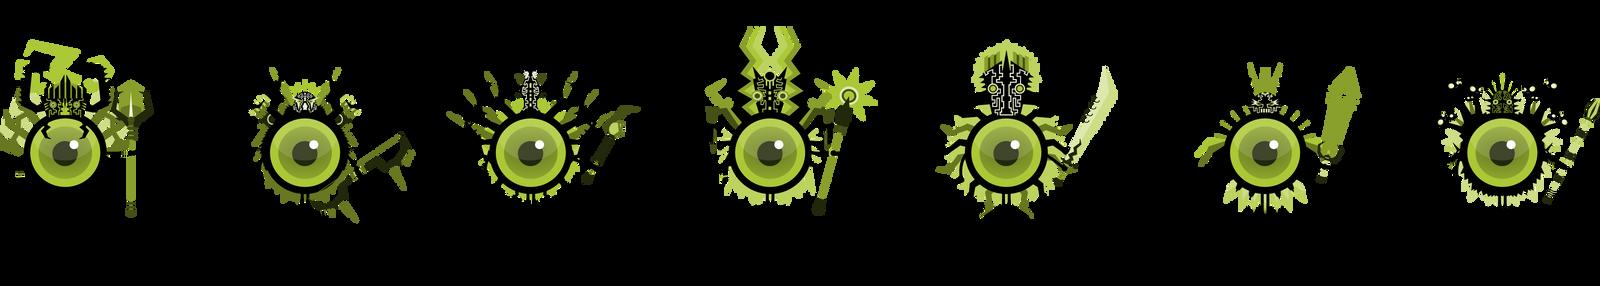 Eyeball Class Set 3 by NightBladeN